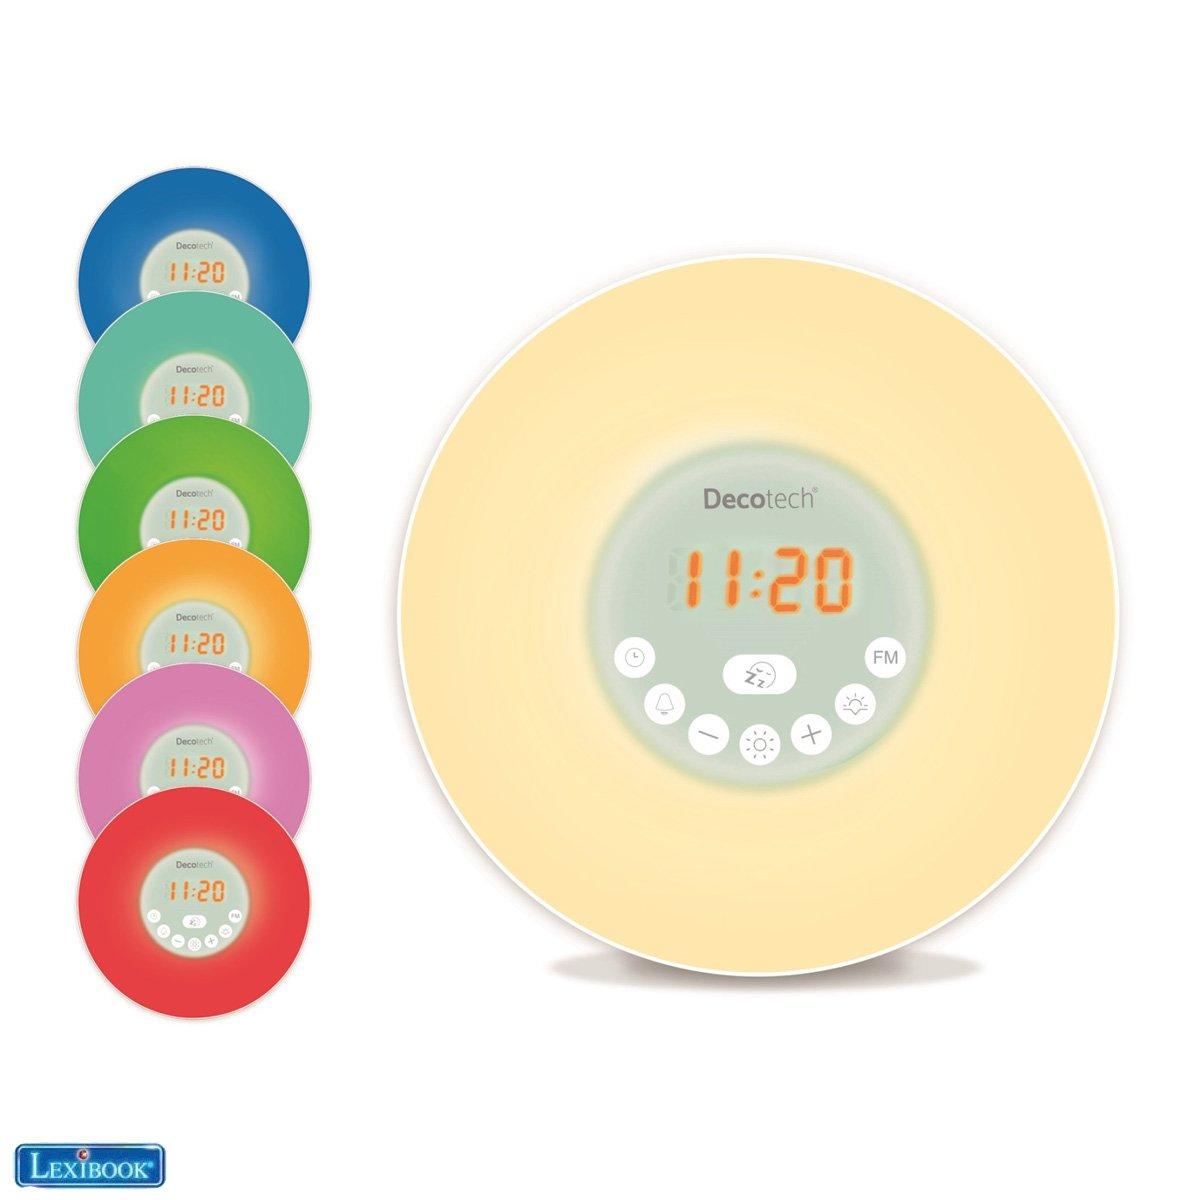 Lexibook - Decotech® Sunrise Colour Alarm Clock (RL998)